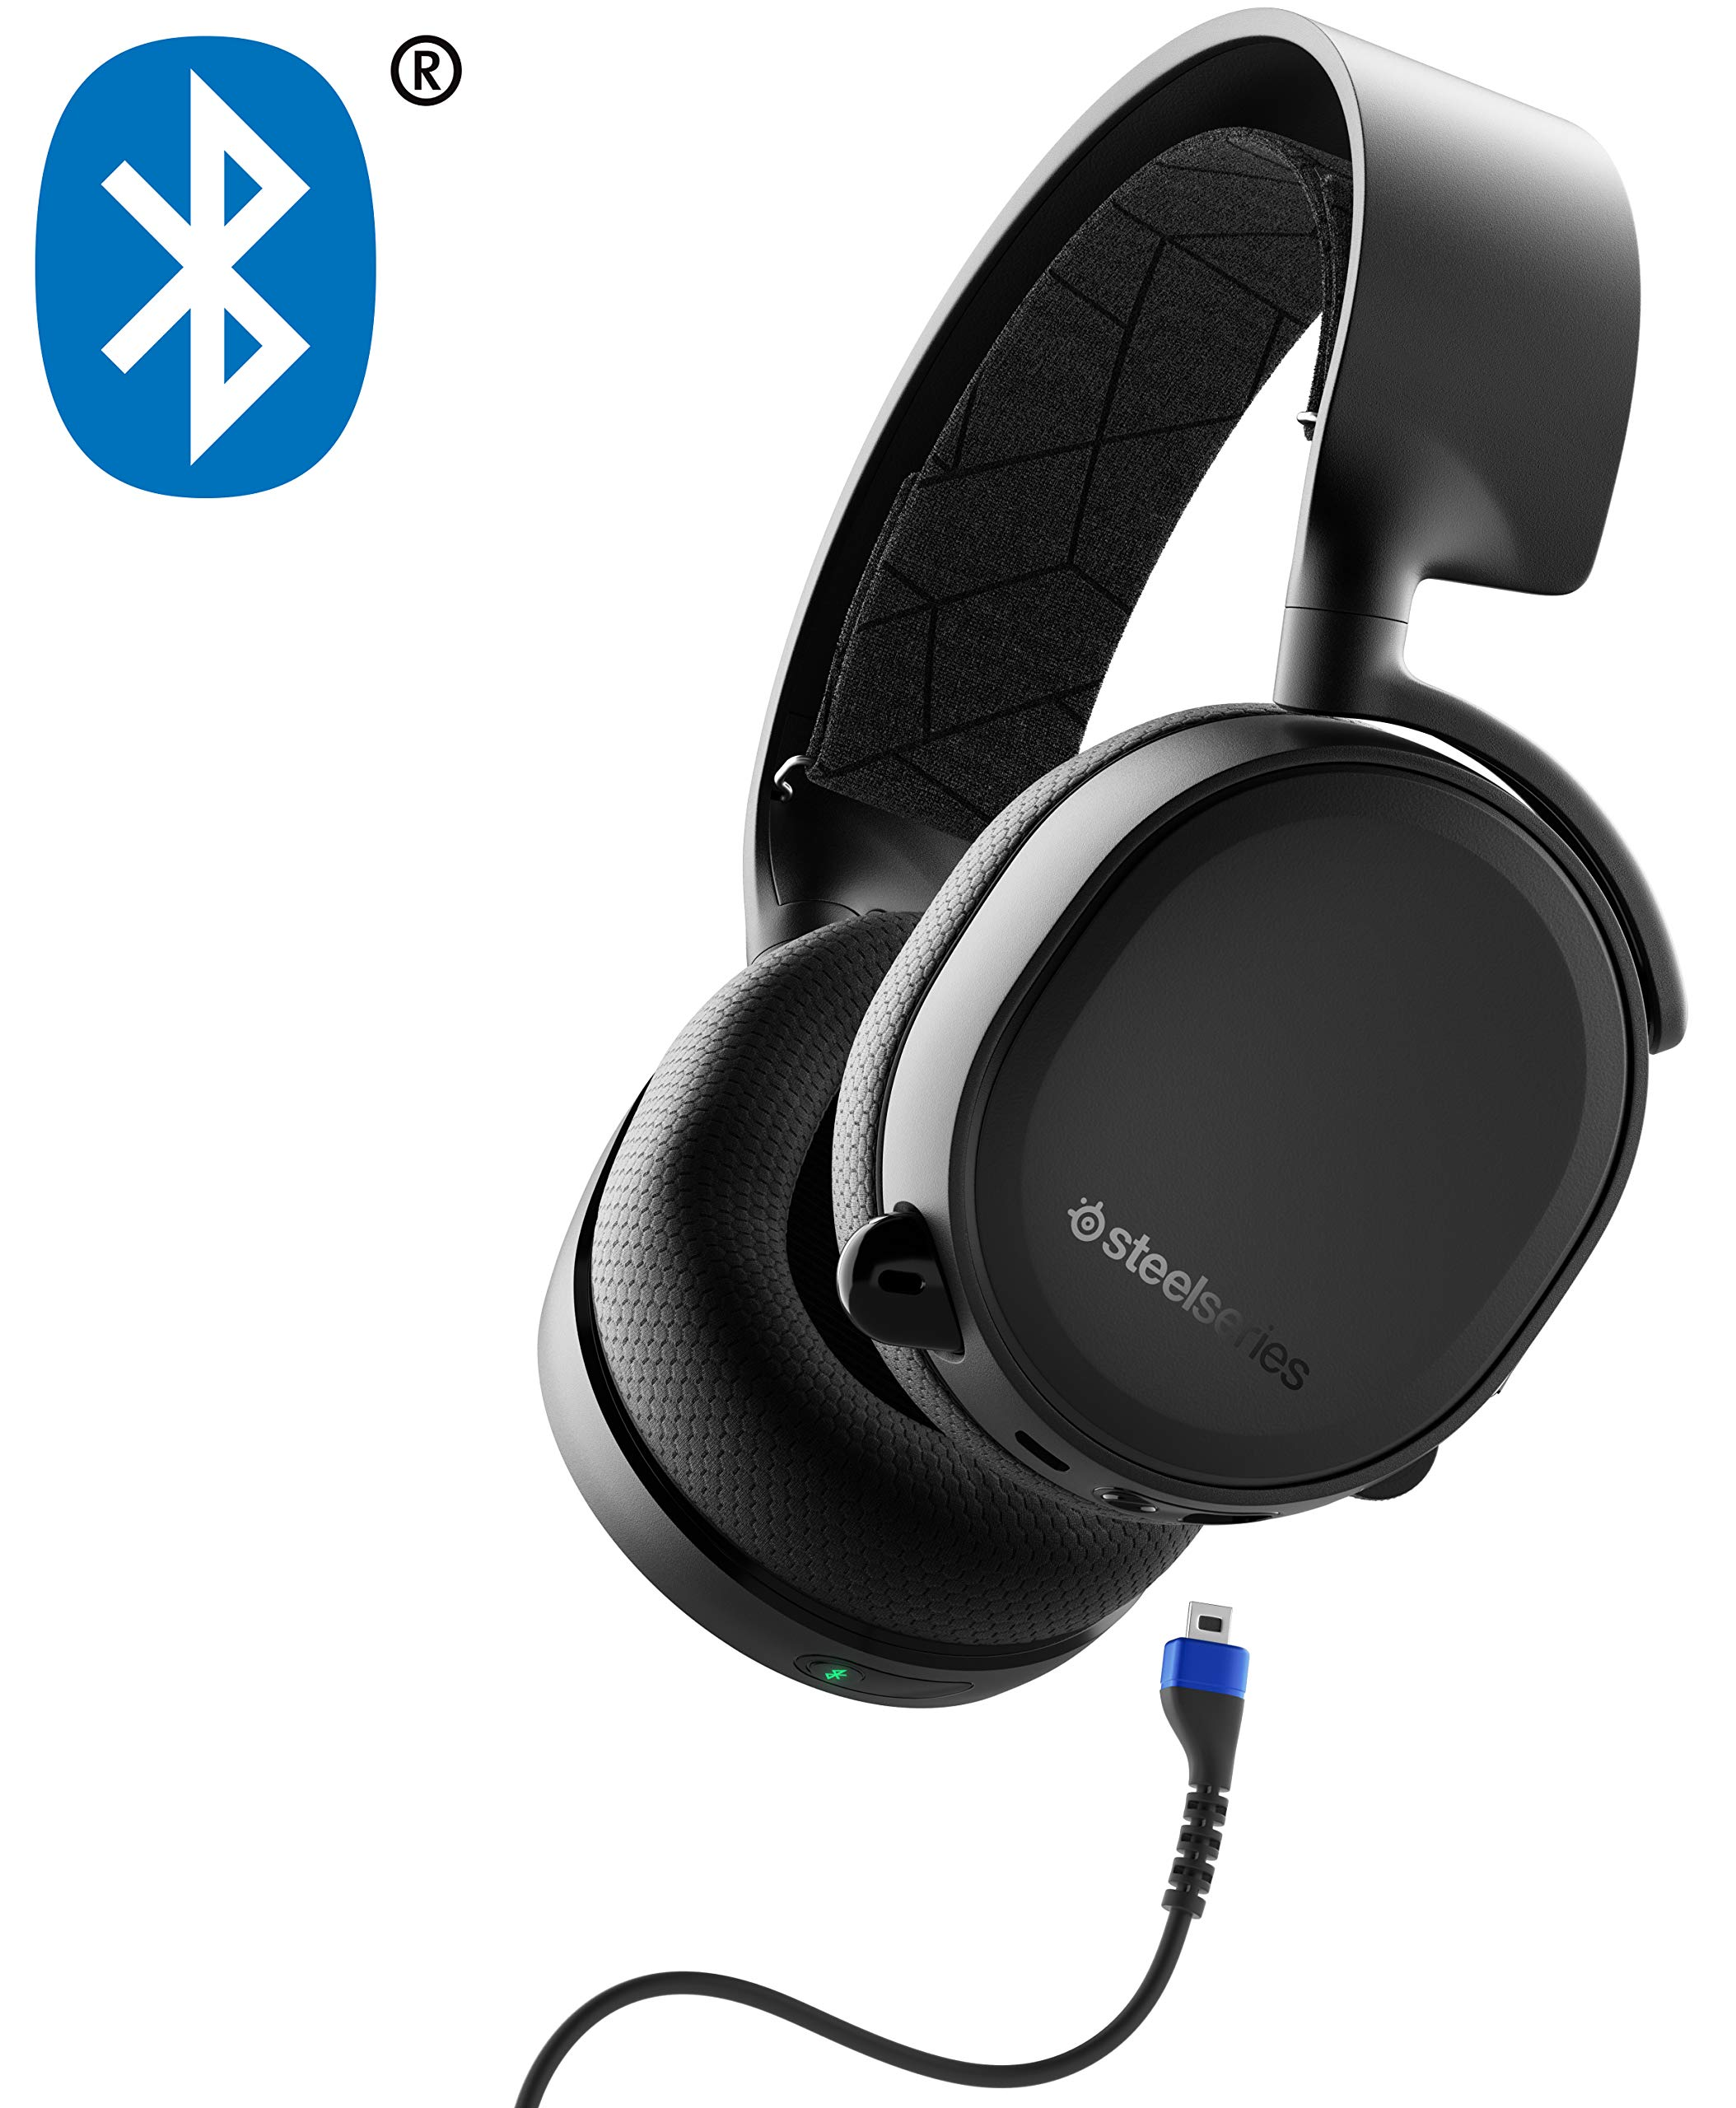 SteelSeries Bluetooth Wireless Nintendo Playstation